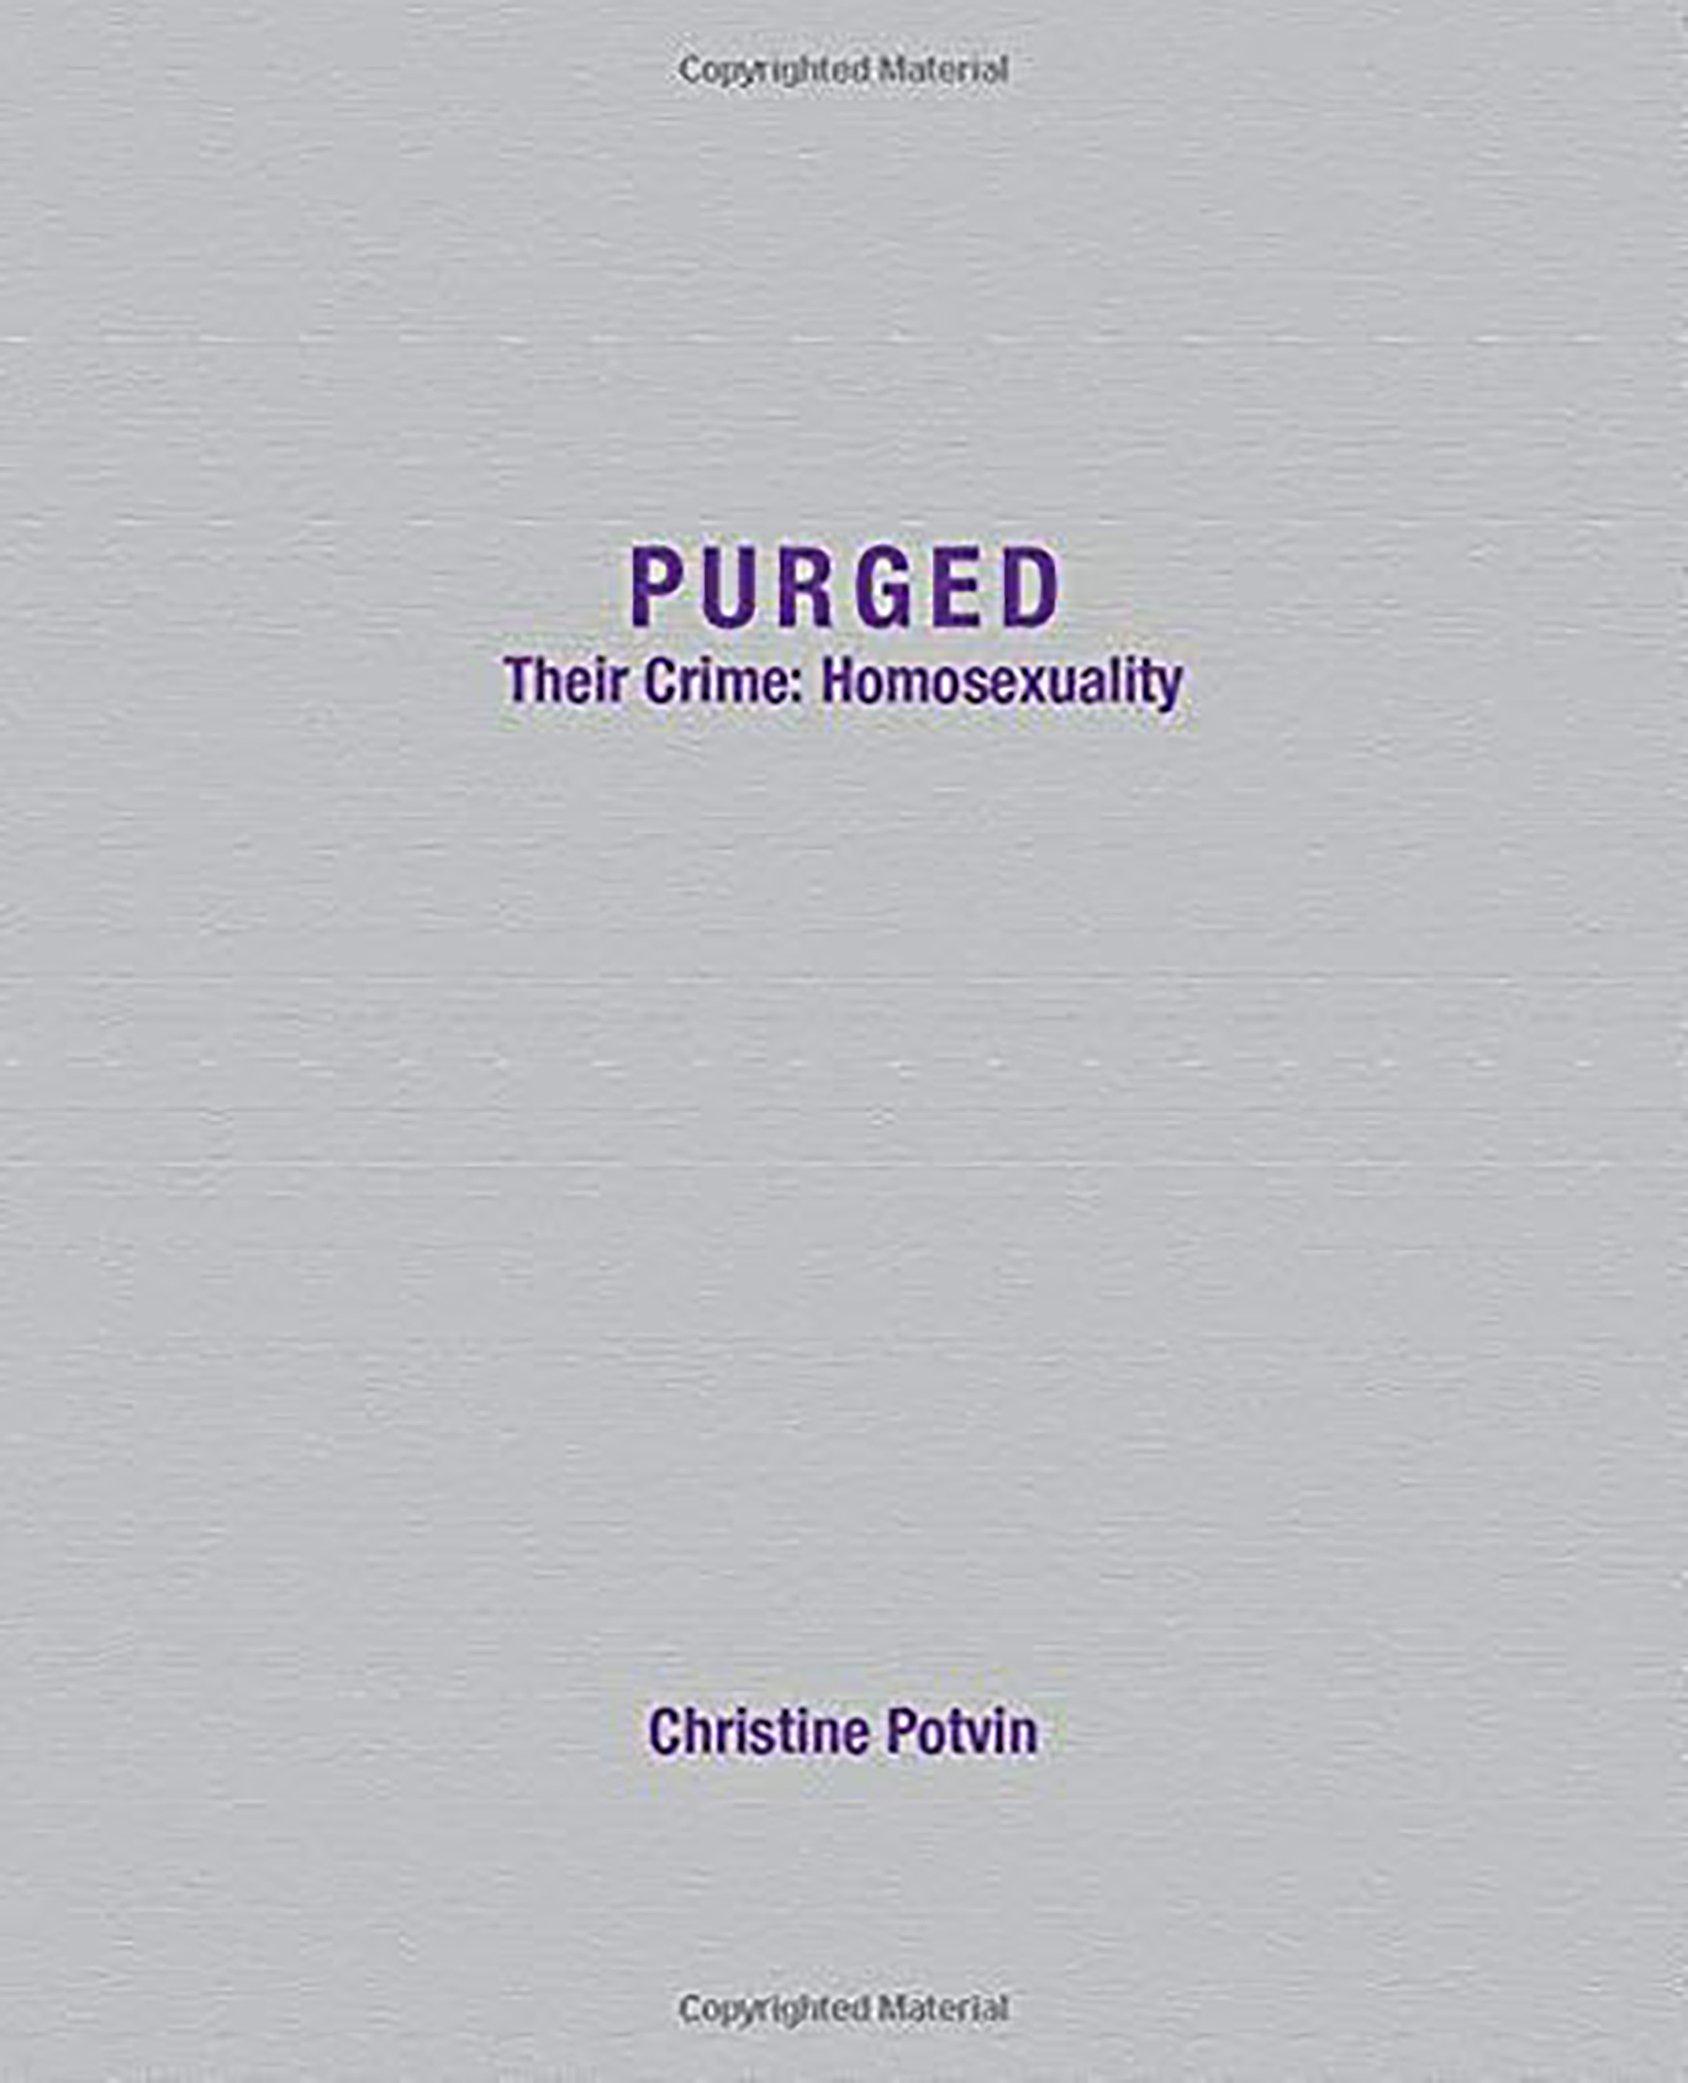 Christine Potvin - Purged